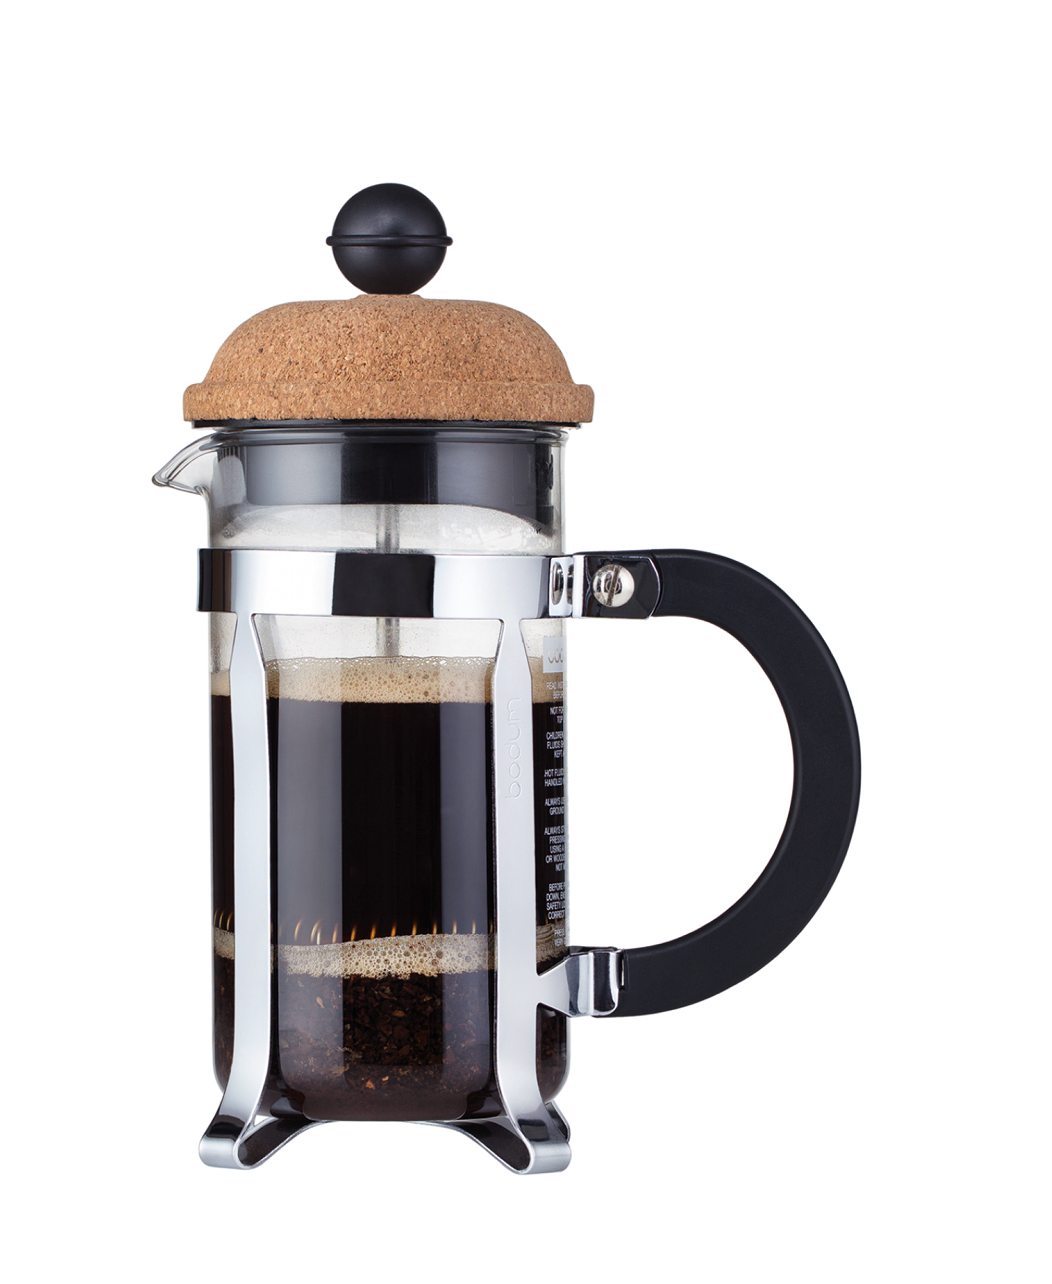 Bodum Cafeti?re Chambord Kurk 0.35 Liter